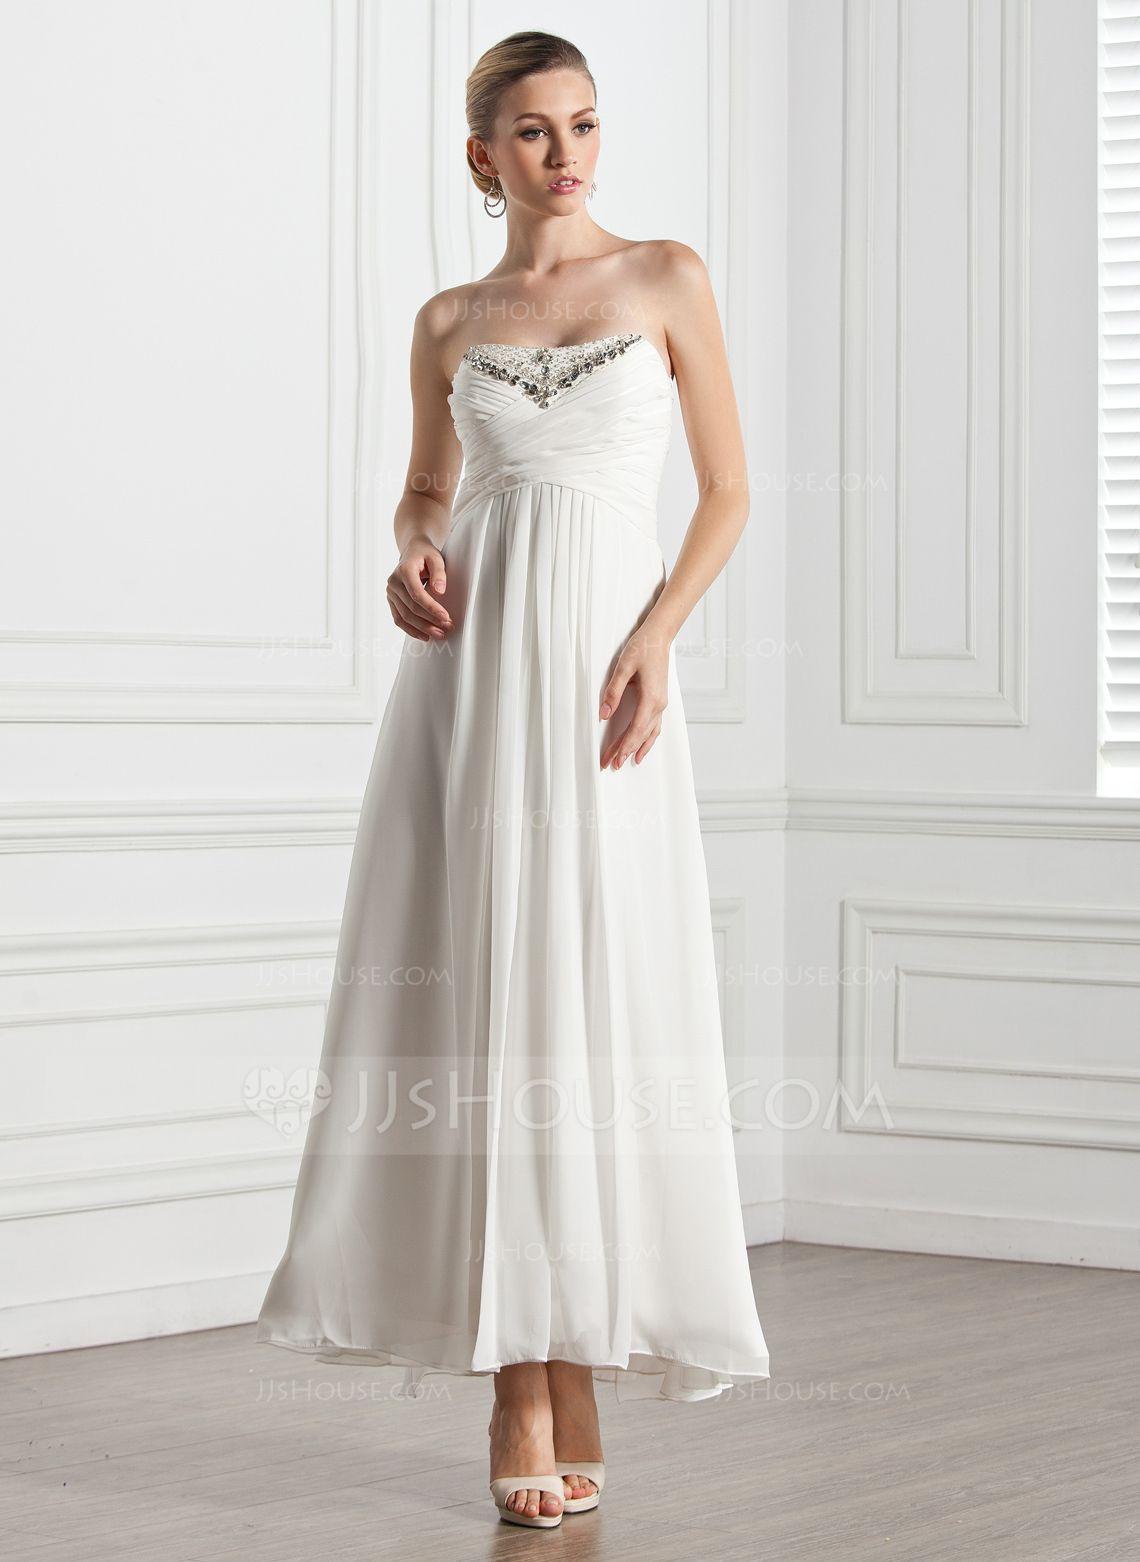 Empire sweetheart anklelength chiffon evening dress with ruffle